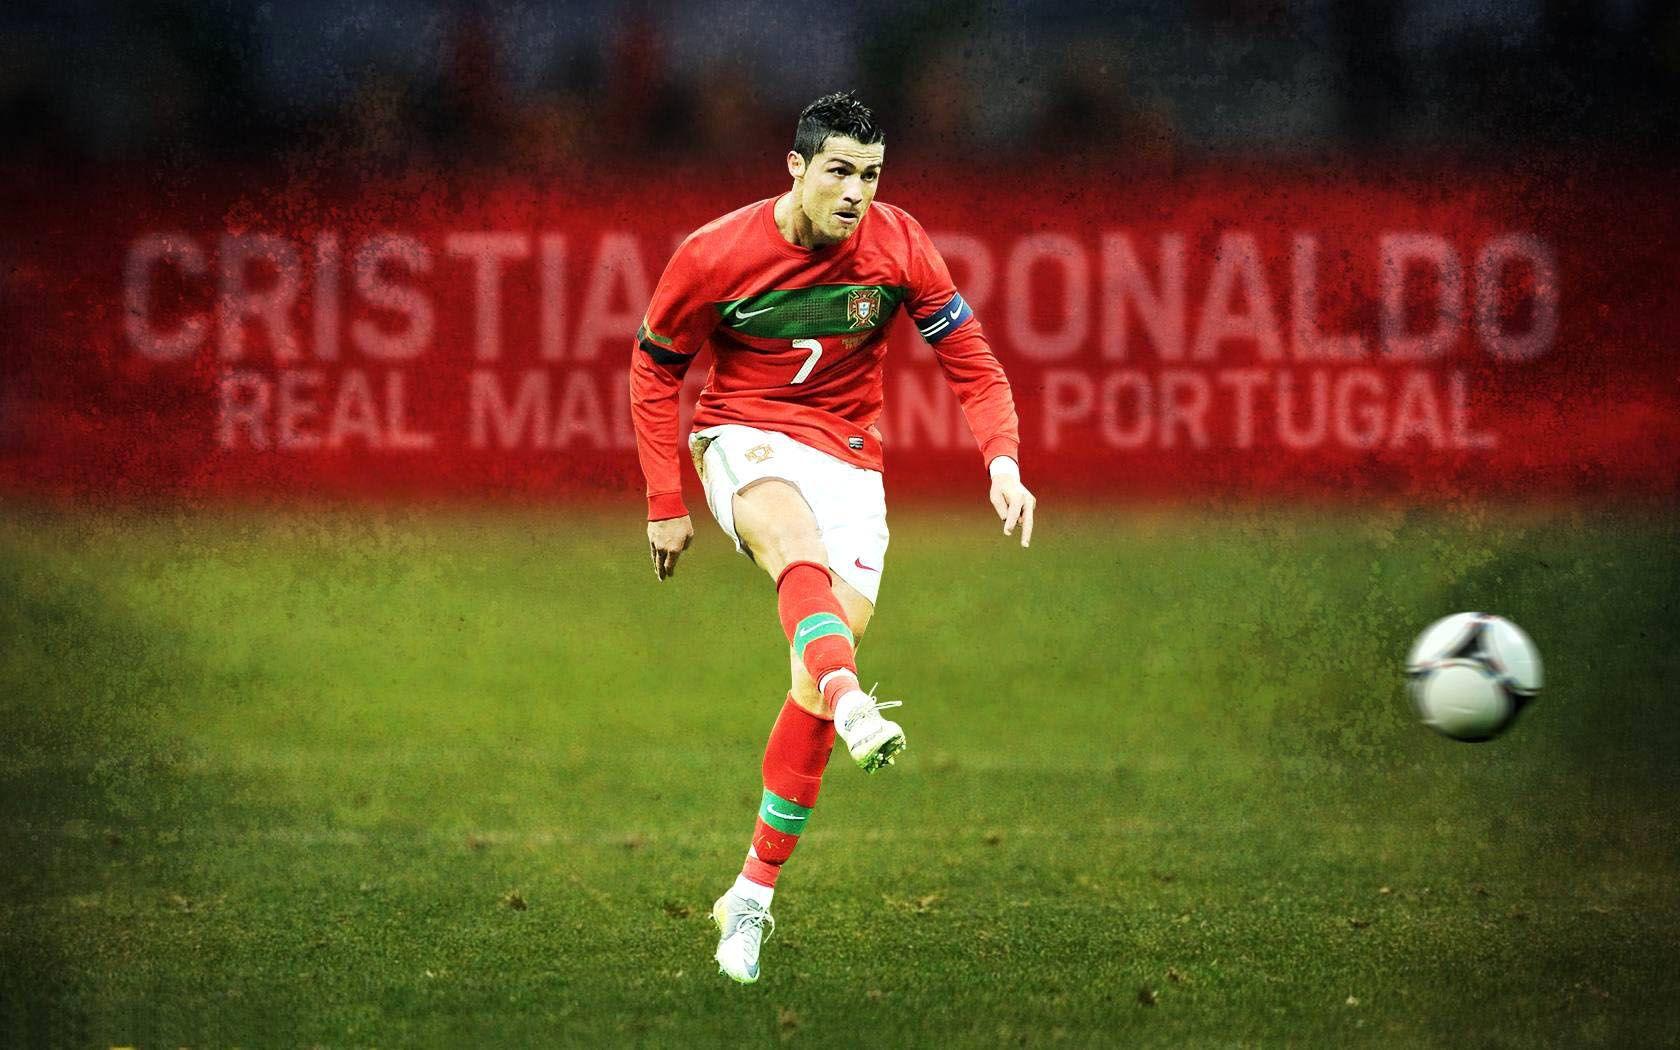 Cristiano Ronaldo Portugal Freekick (Cristiano Ronaldo)  28ea3148f4ee1